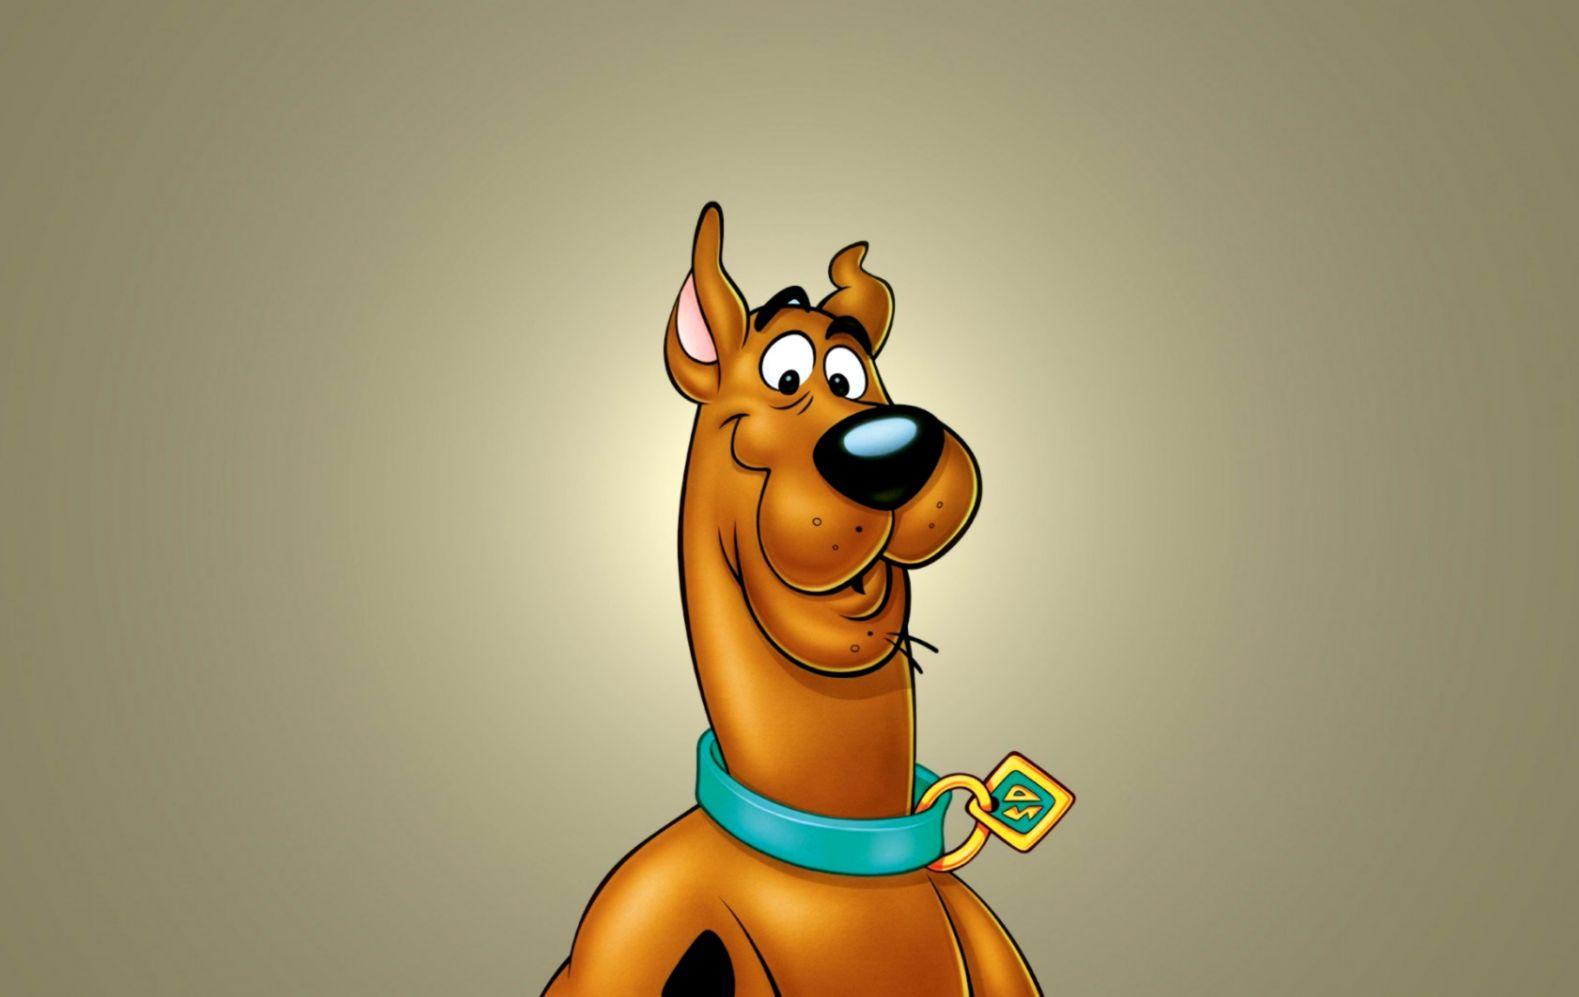 Scooby Doo Dog Drawing Cartoon Hd Wallpaper Wallpapers Photos 1579x997